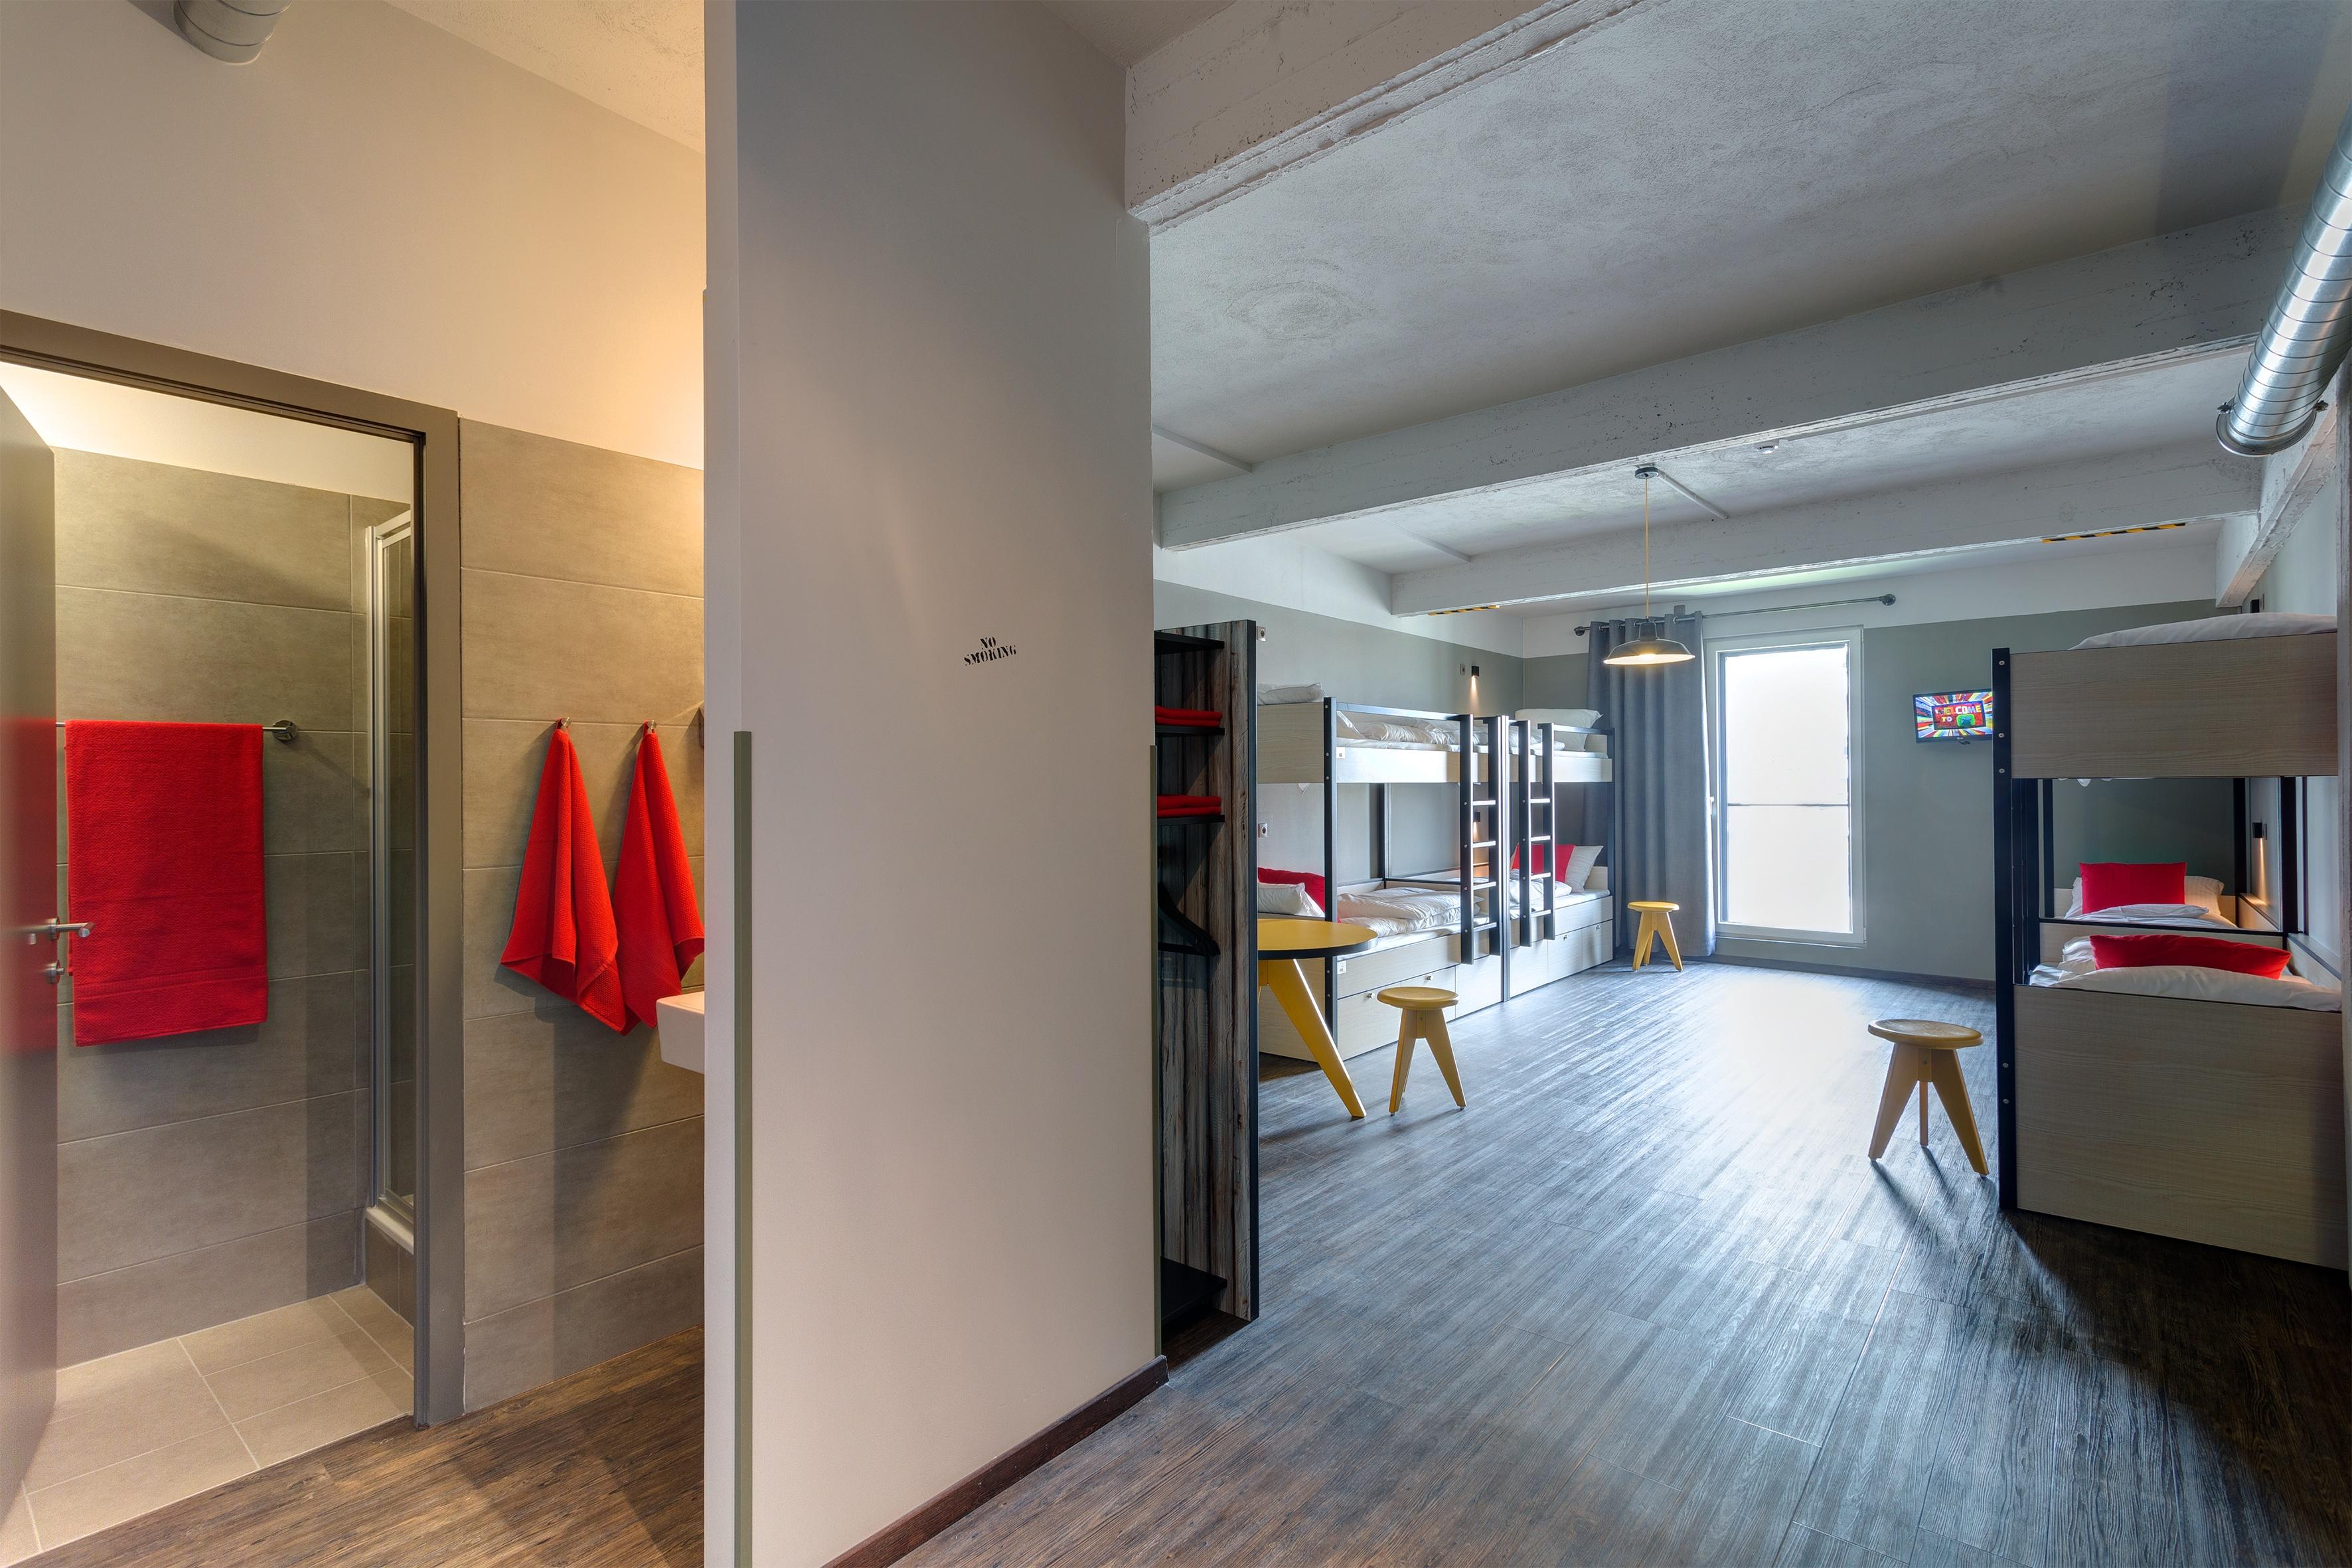 MEININGER Hotel Brussels City Center - Dormitory